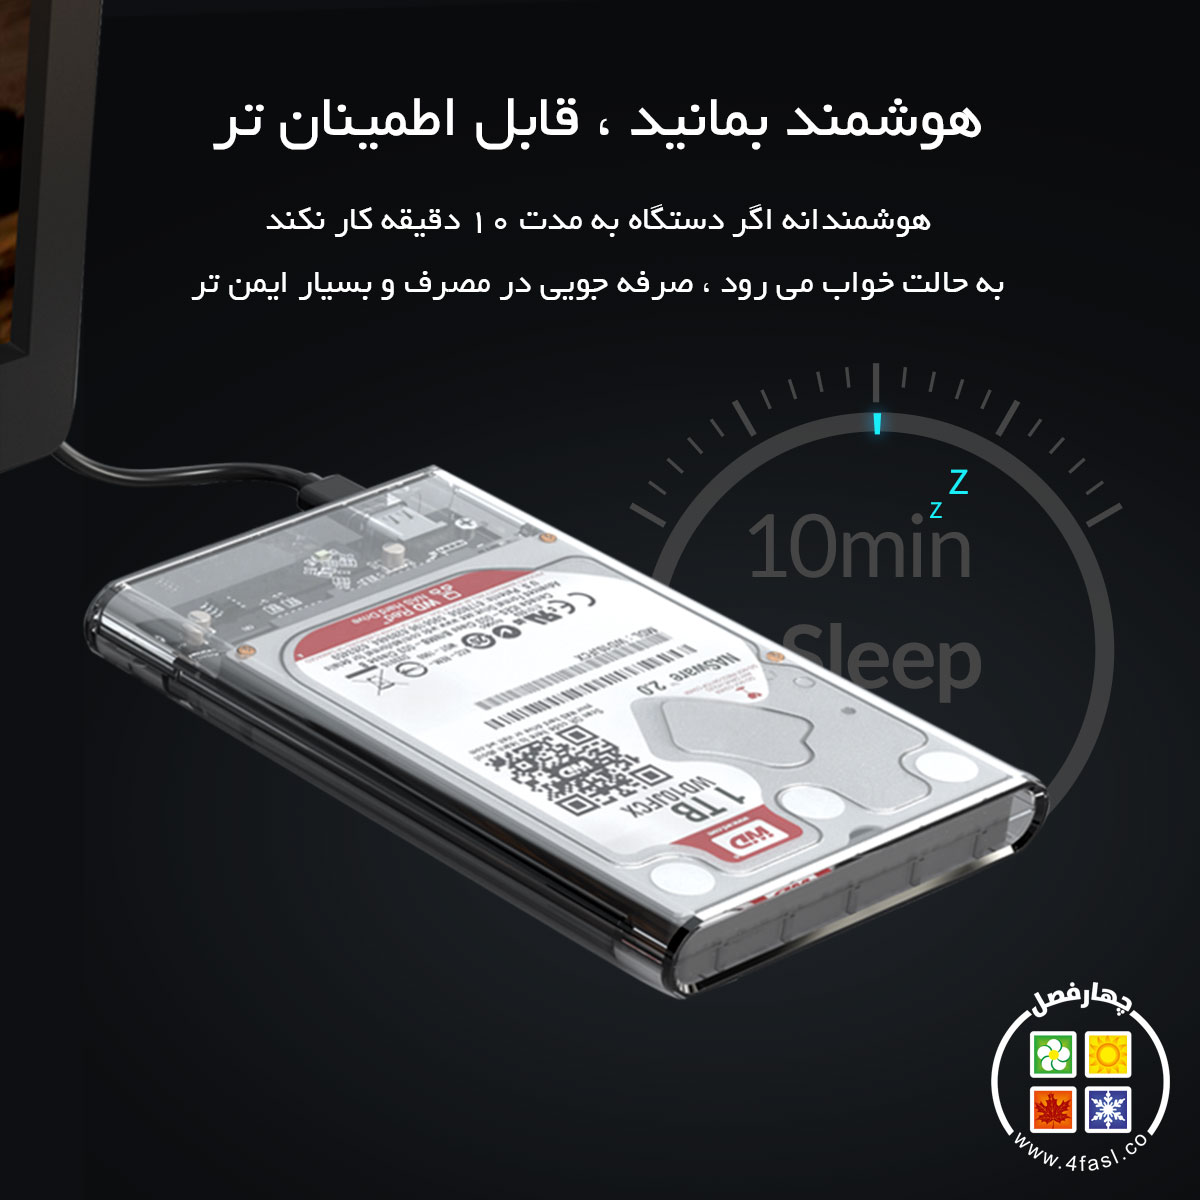 باکس SSD و هارد Type-C 10Gbps